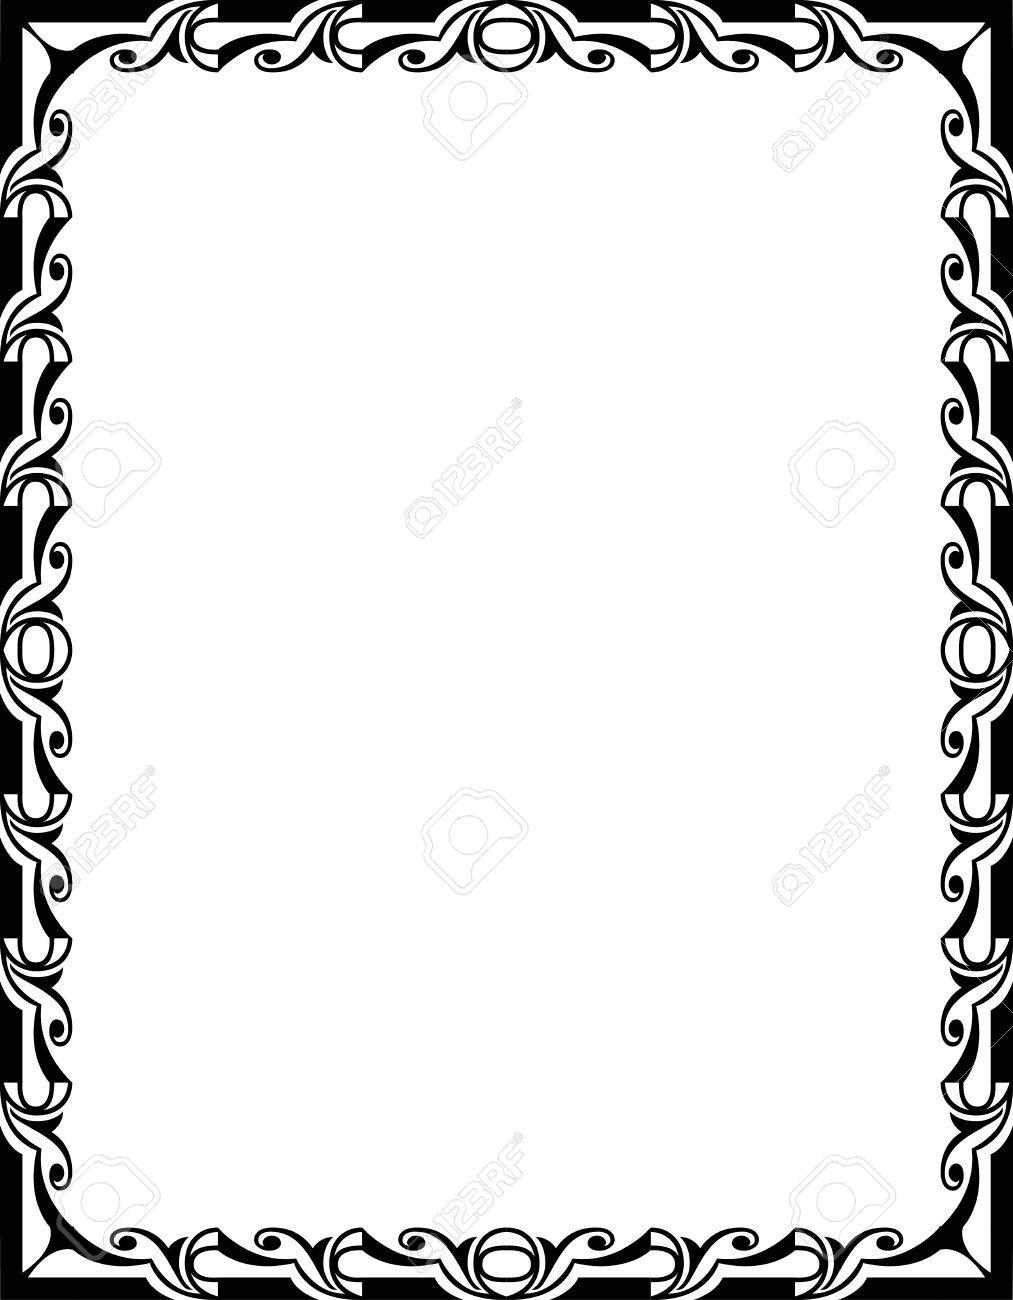 Ornamental Border Frame, In Editable Vector File, Black And White ...